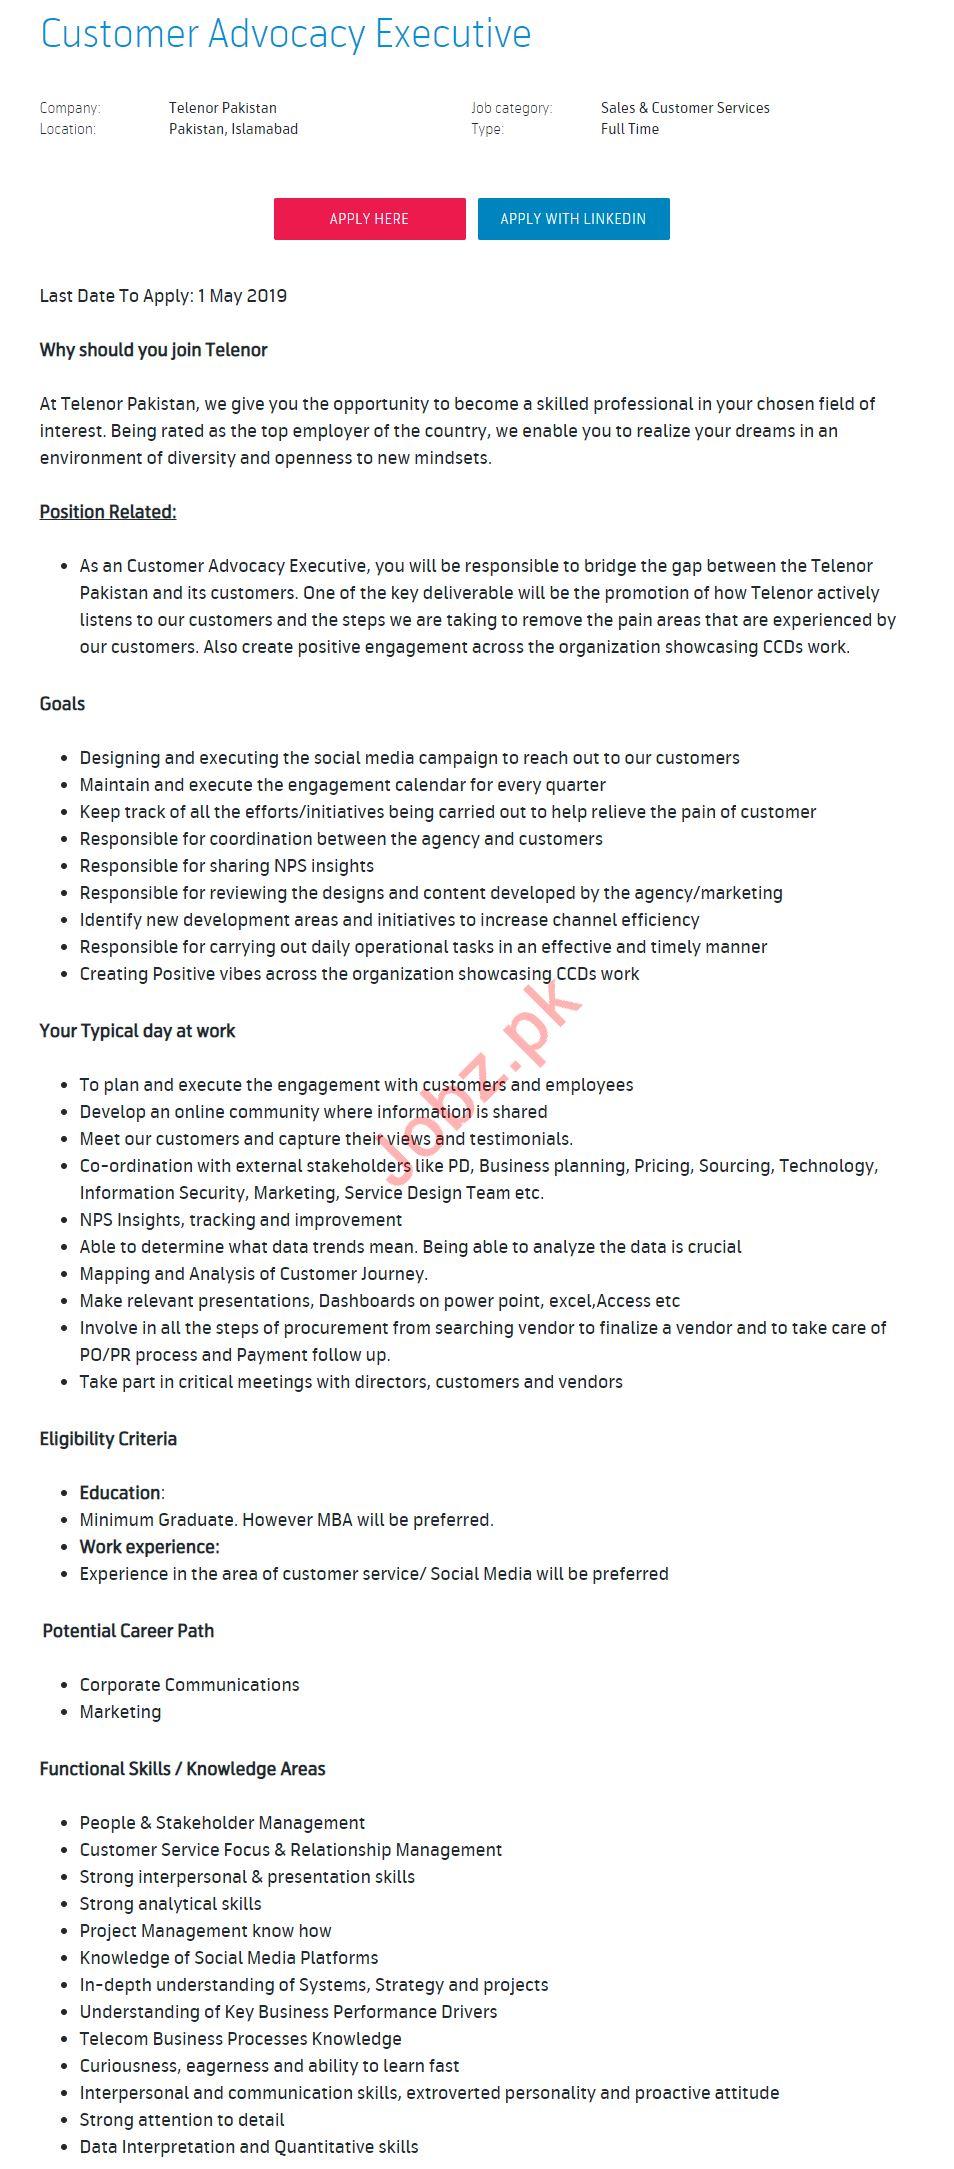 Customer Advocacy Executive Jobs 2019